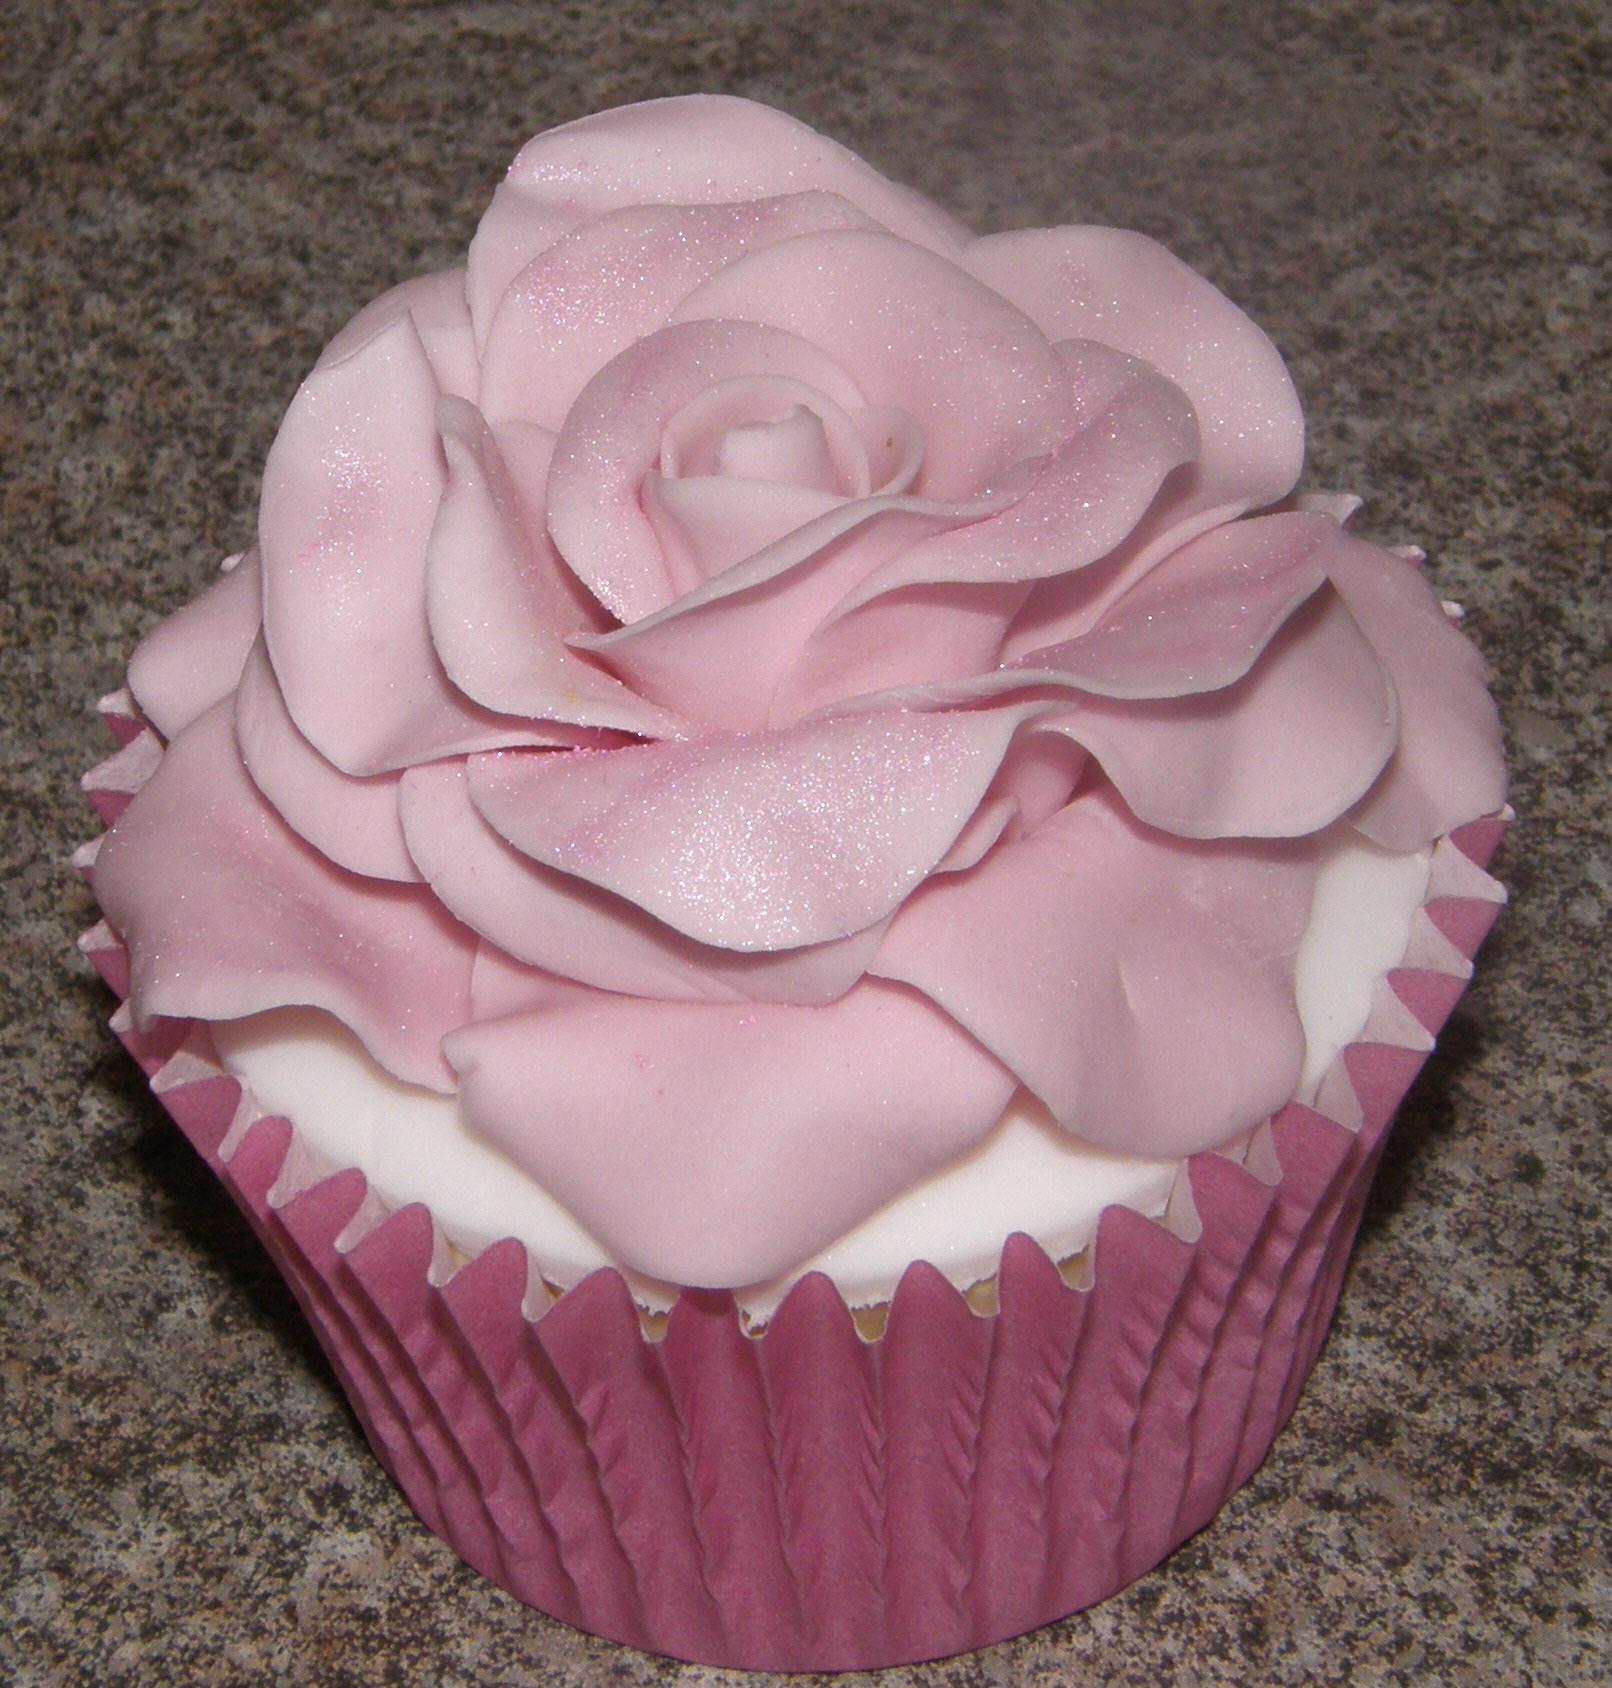 Cupcake Ideas Cupcakes Shmupcakes Cupcake Ideas